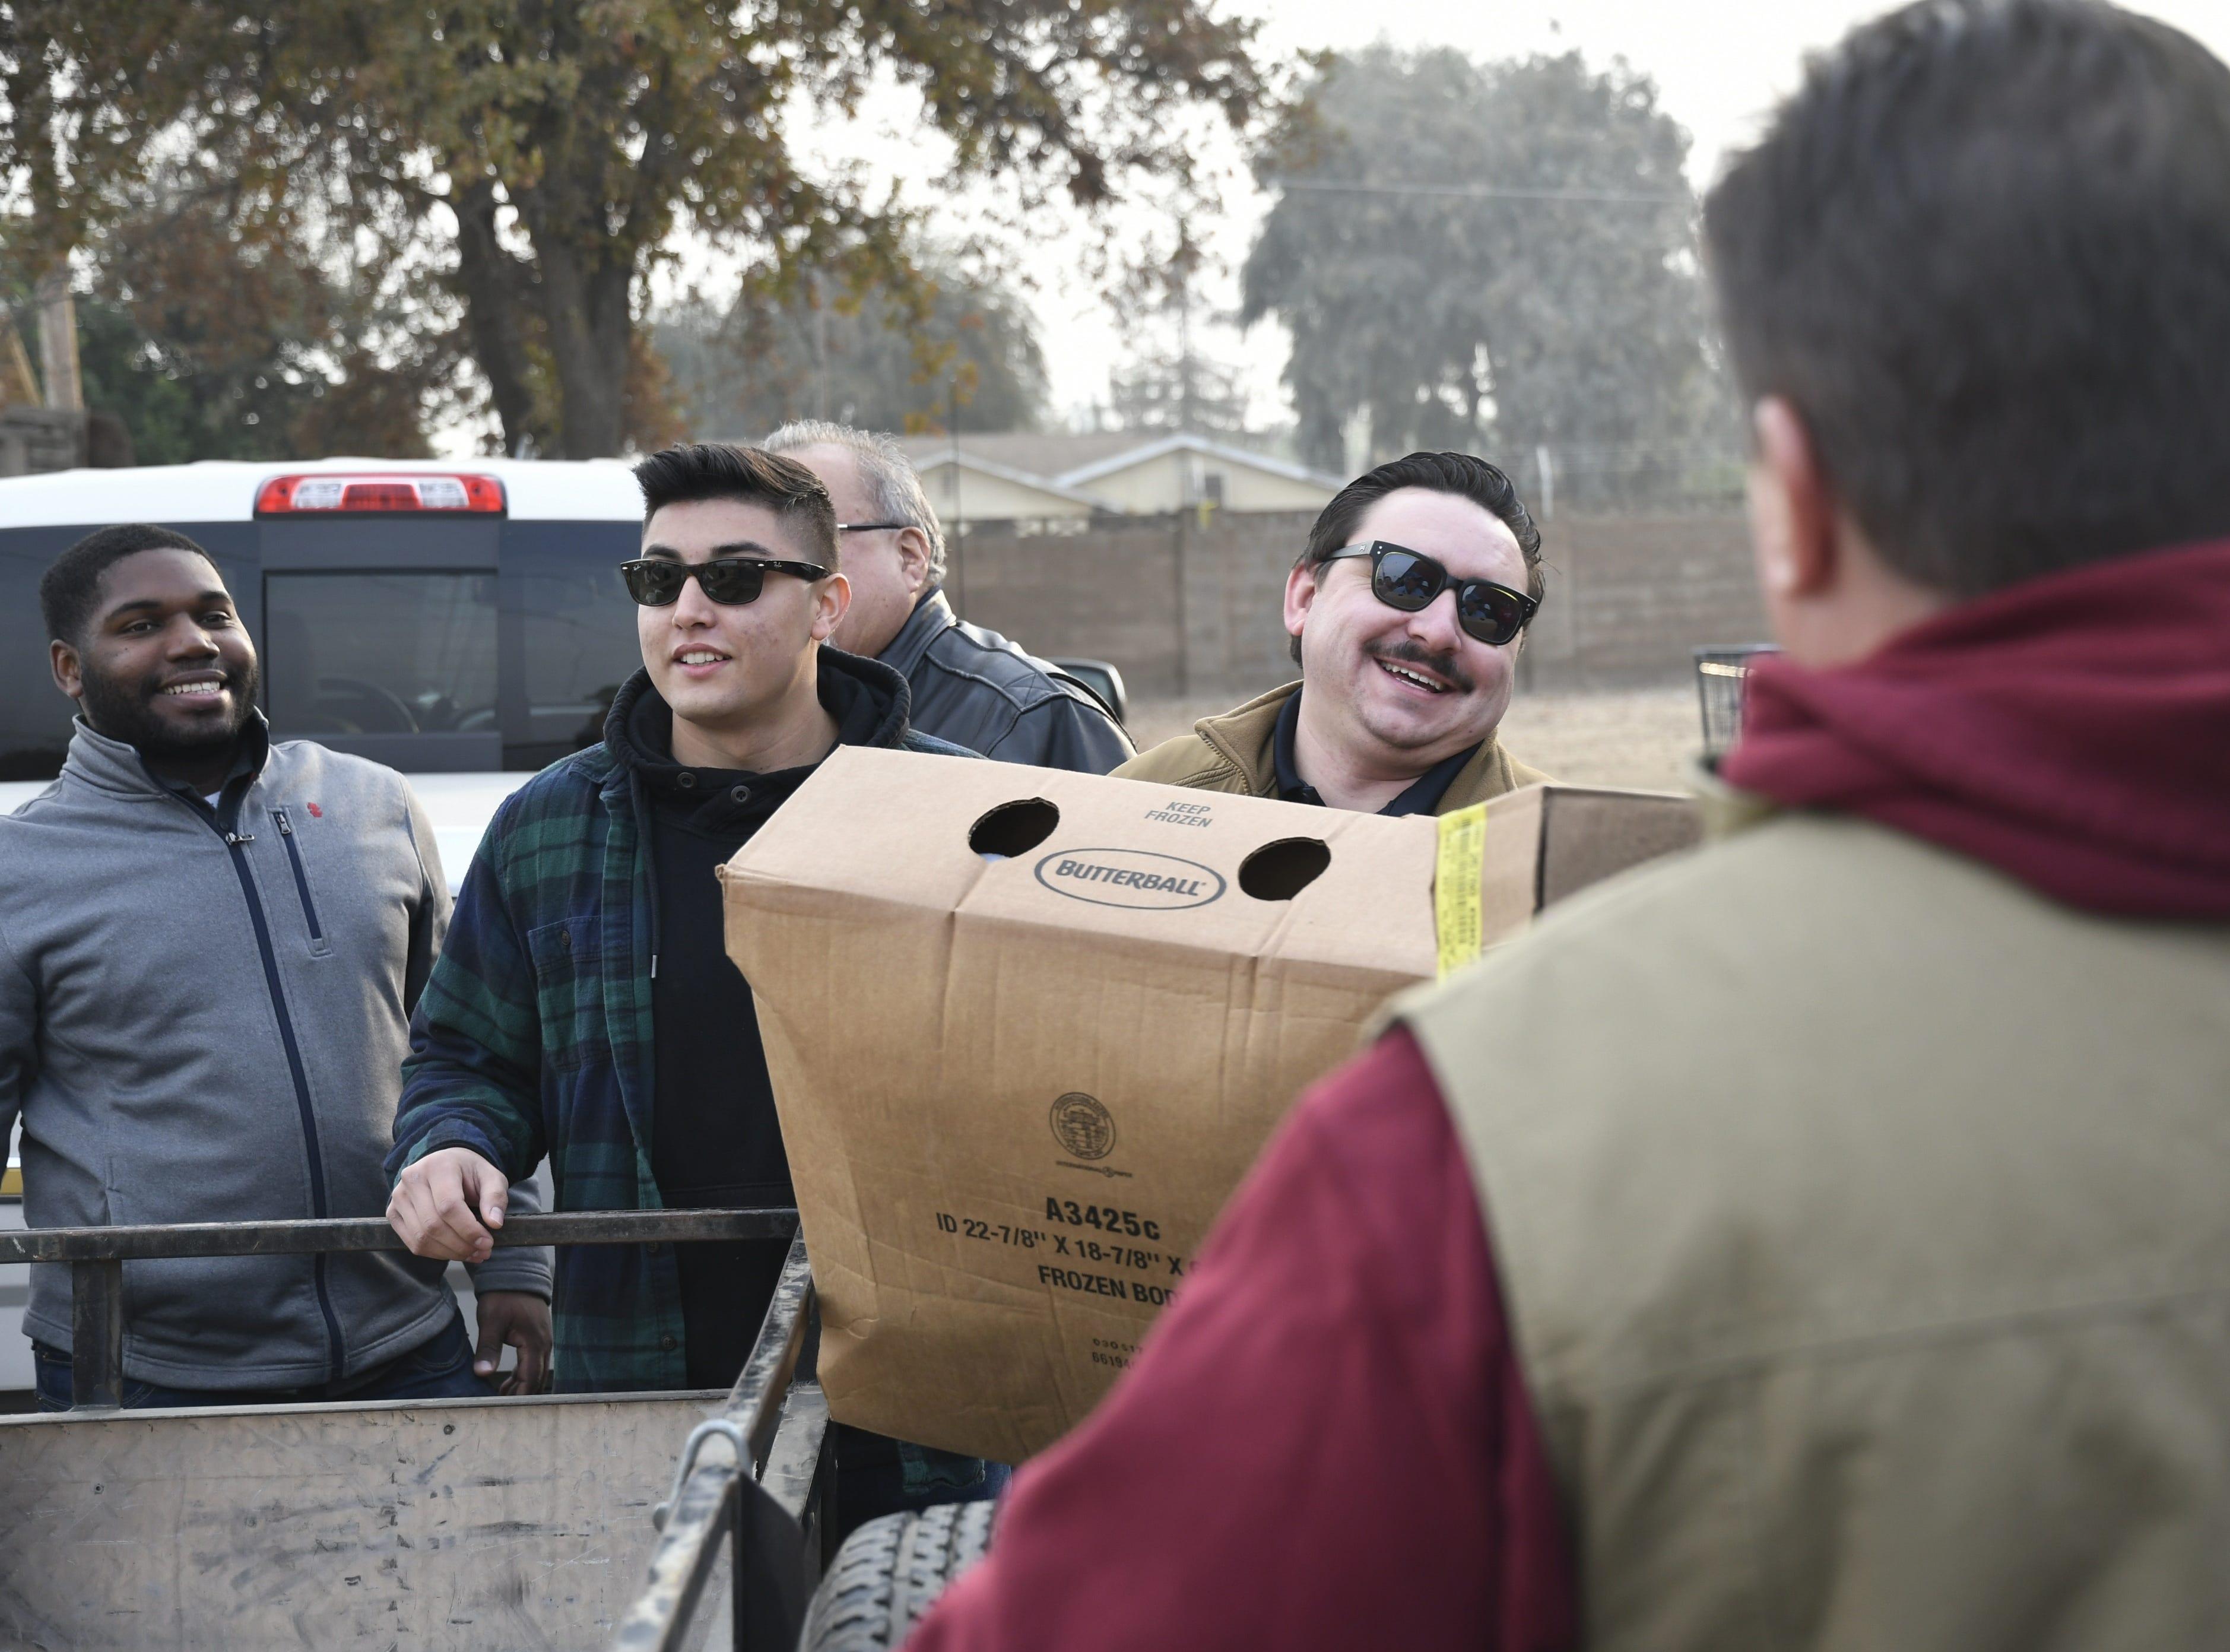 Members of Visalia Breakfast Lions Club delivered more than 1,100 turkeys on Monday, Nov. 19.